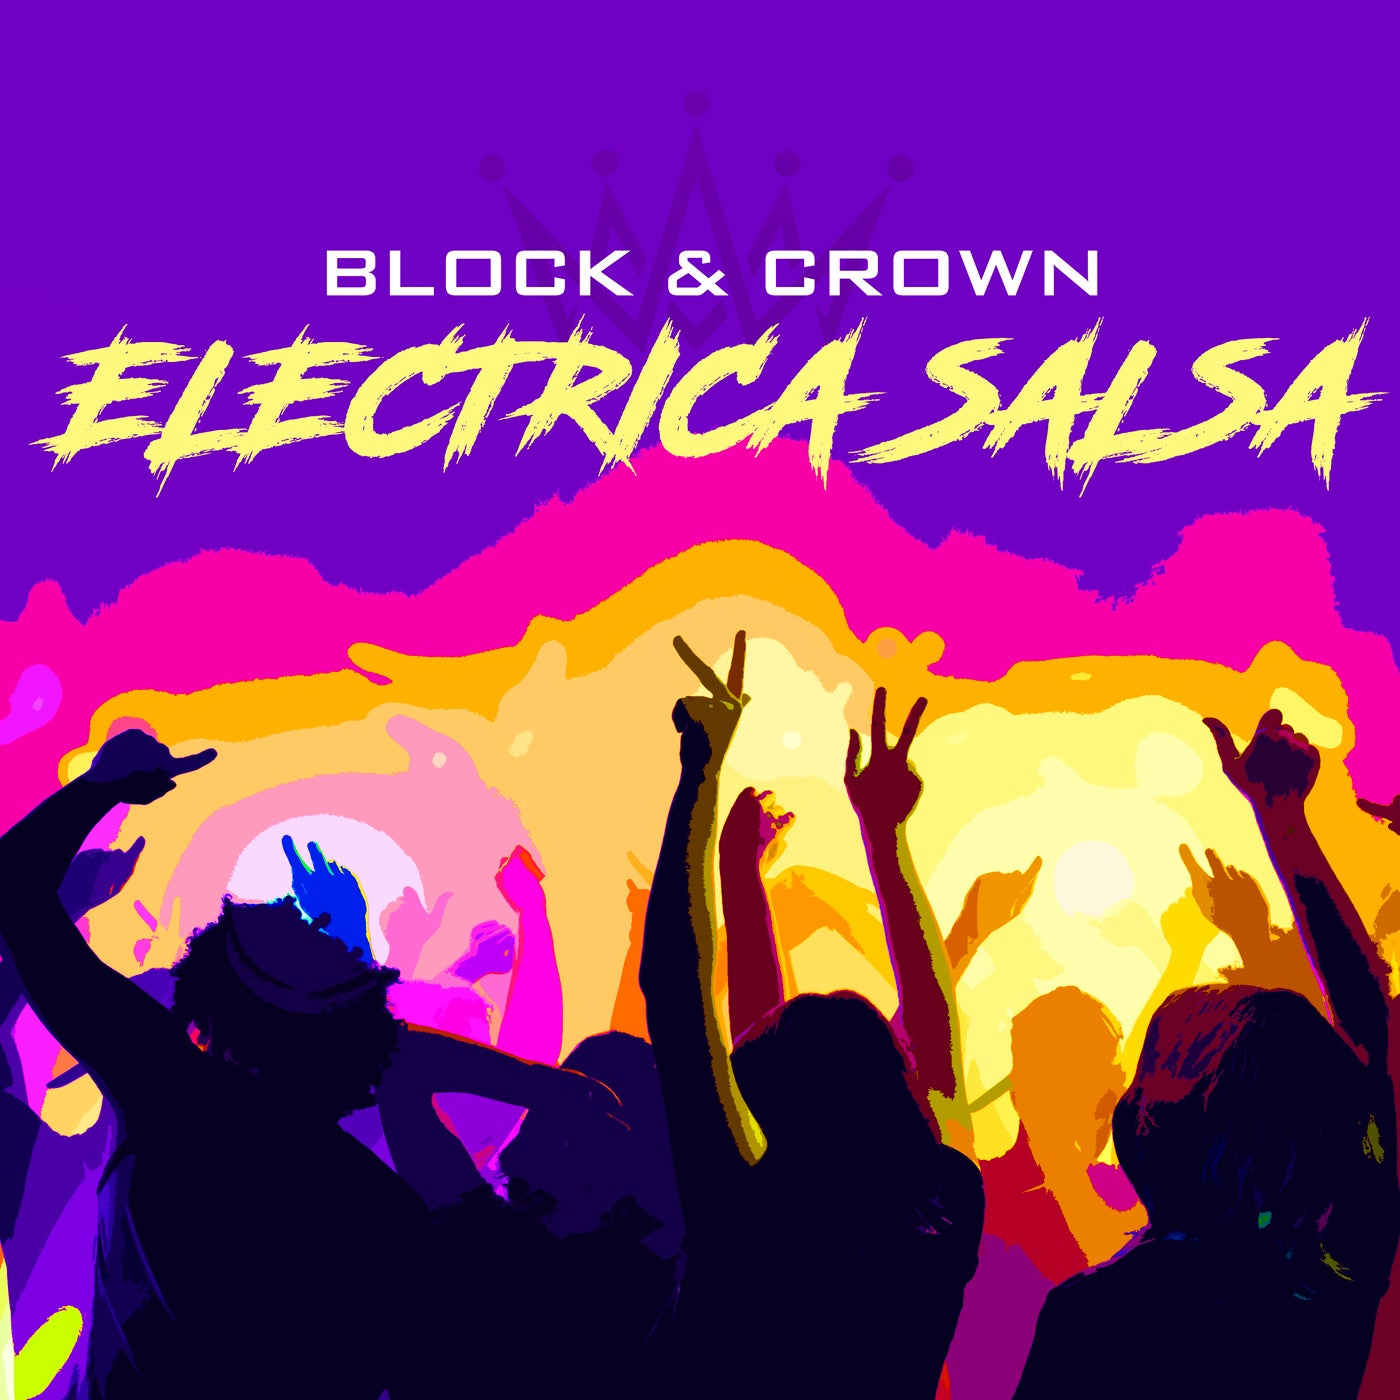 Electrica Salsa (Block & Crown Nu Disco Extended Remix)